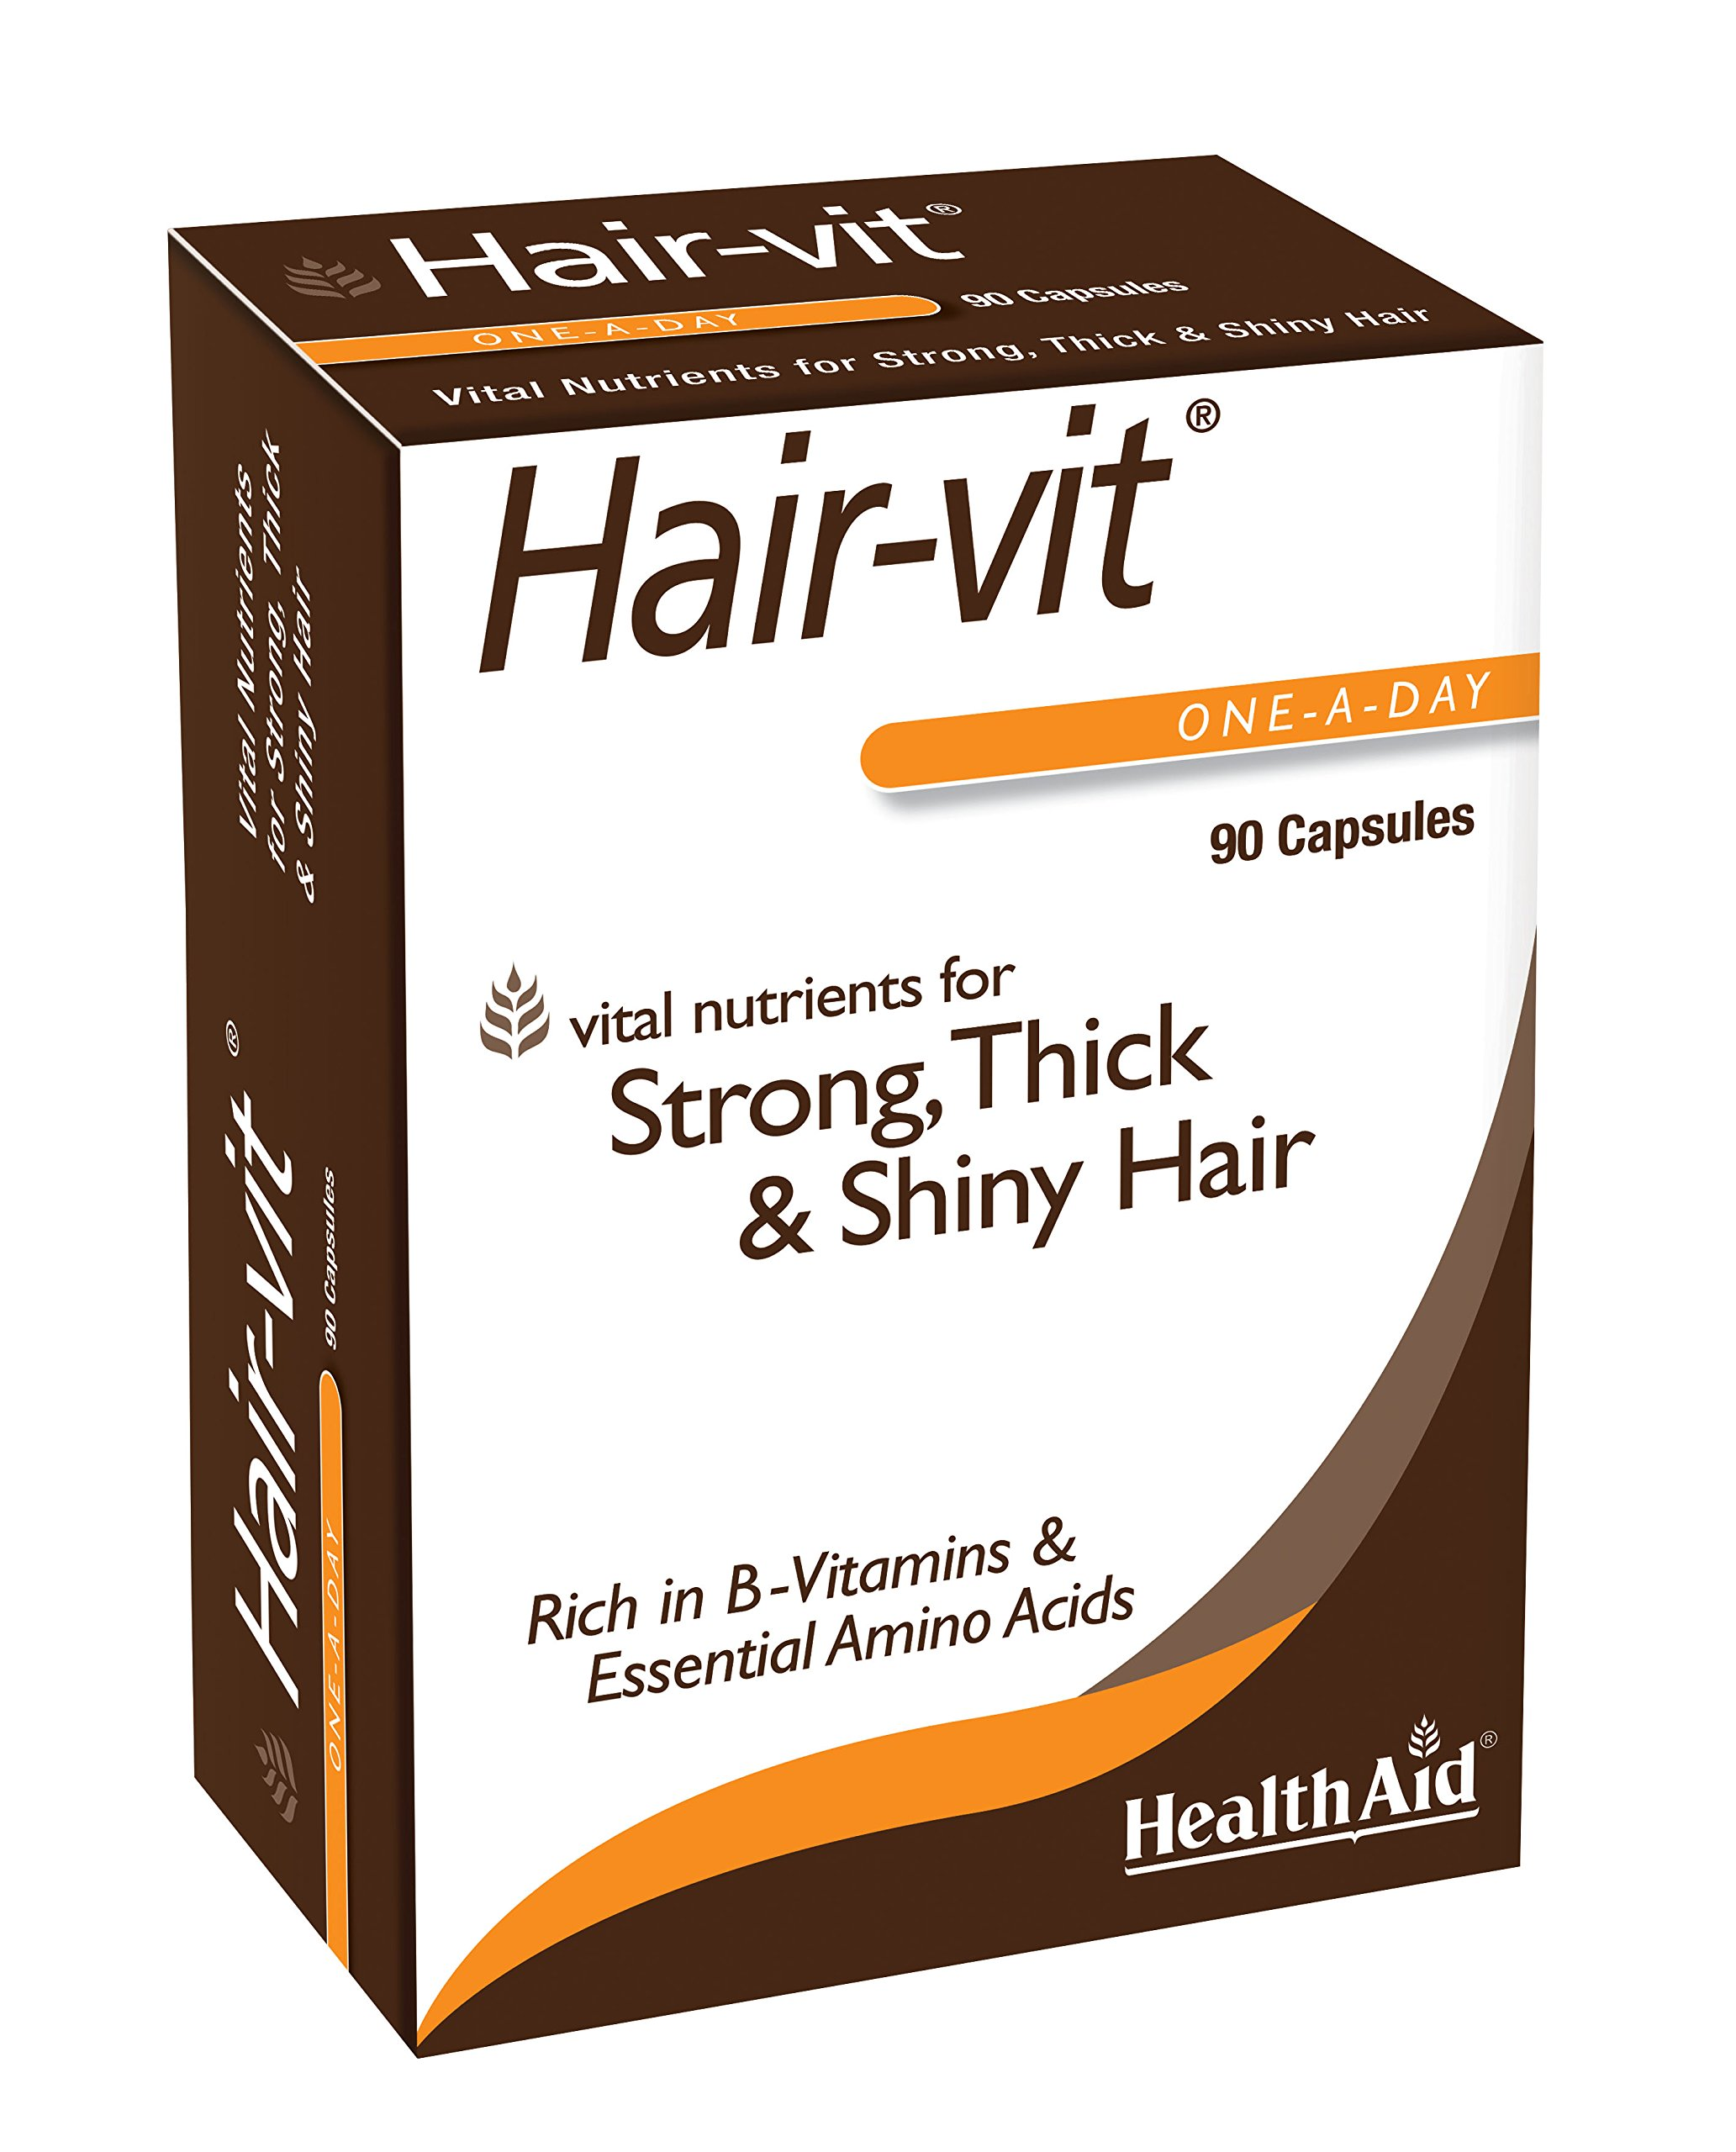 Hair Vit One a Day 90 Capsules